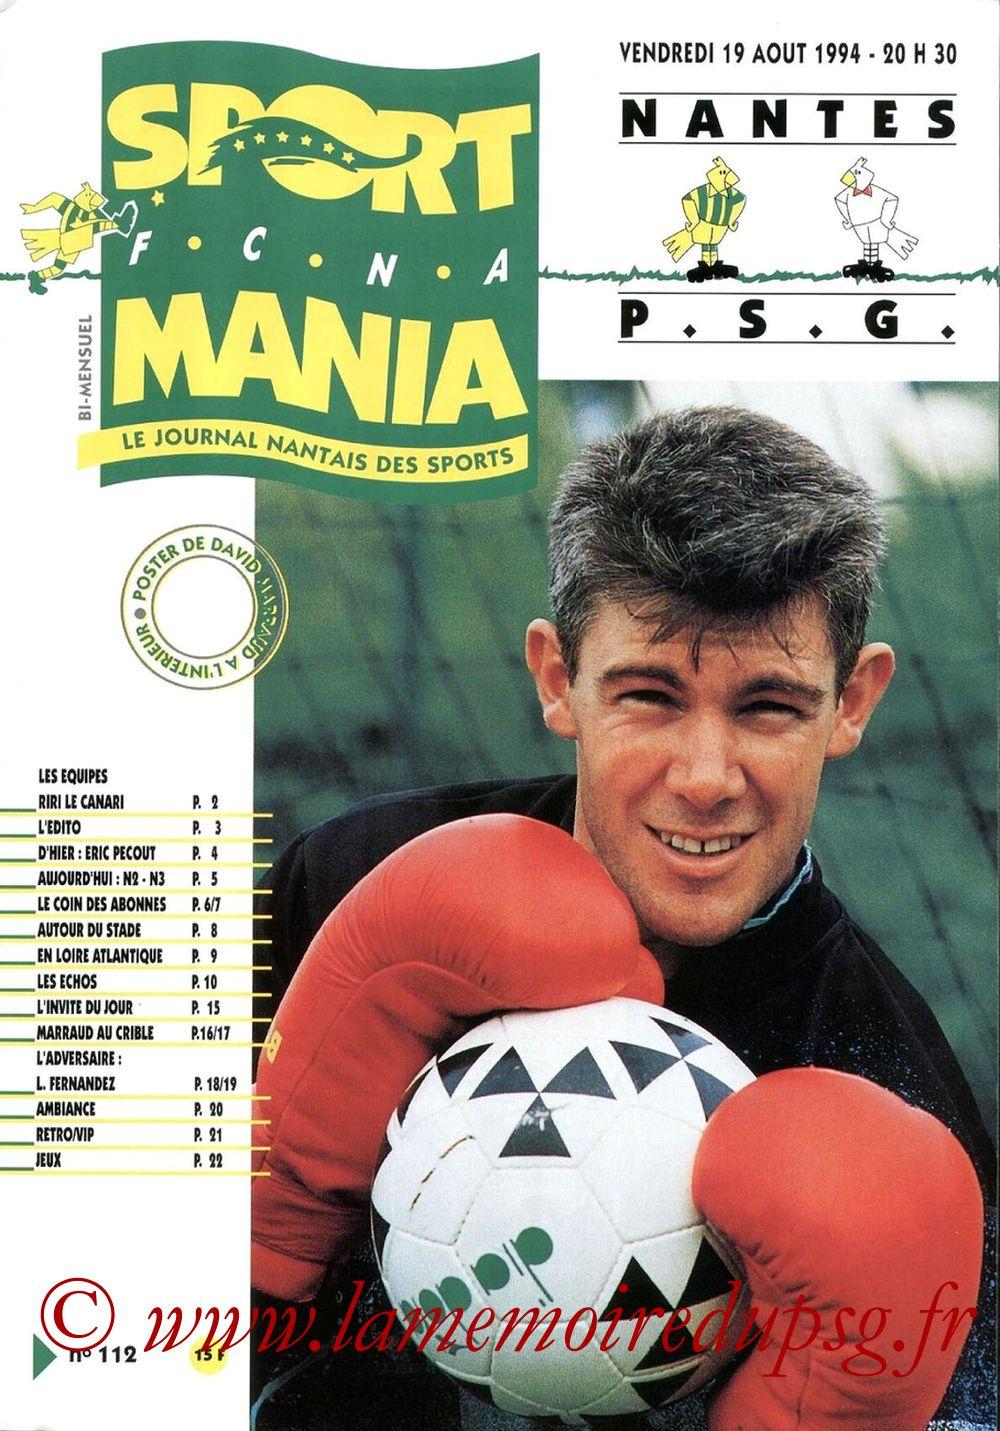 1994-08-19  Nantes-PSG (5ème D1, Sportmania N°112)